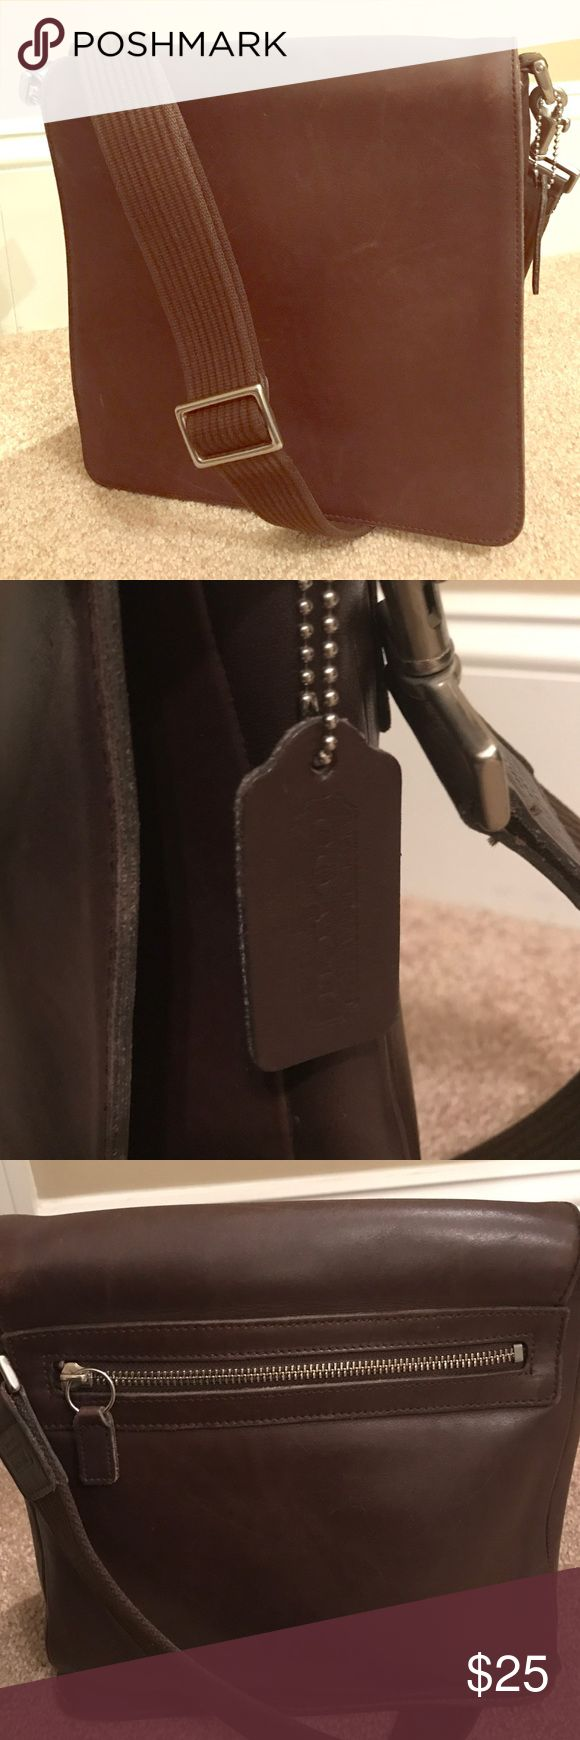 Coach Messenger Bag Coach espresso leather messenger bag with adjustable canvas strap. Coach Bags Crossbody Bags